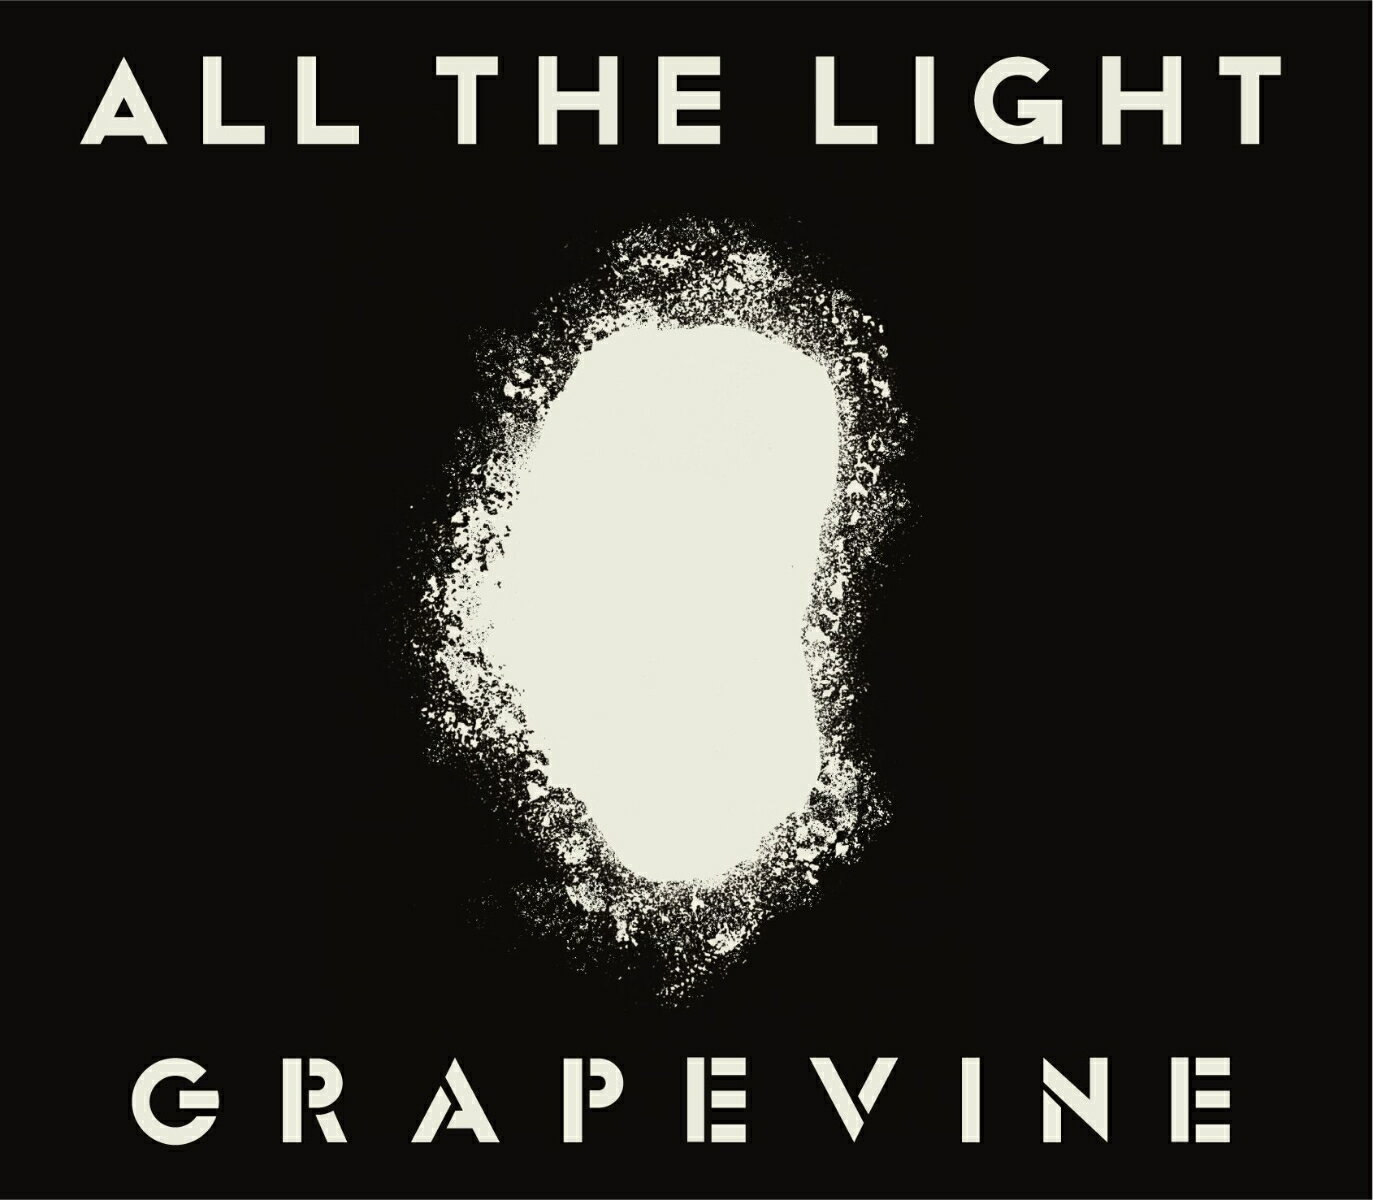 ALL THE LIGHT (初回限定盤 CD+DVD) [ GRAPEVINE ]